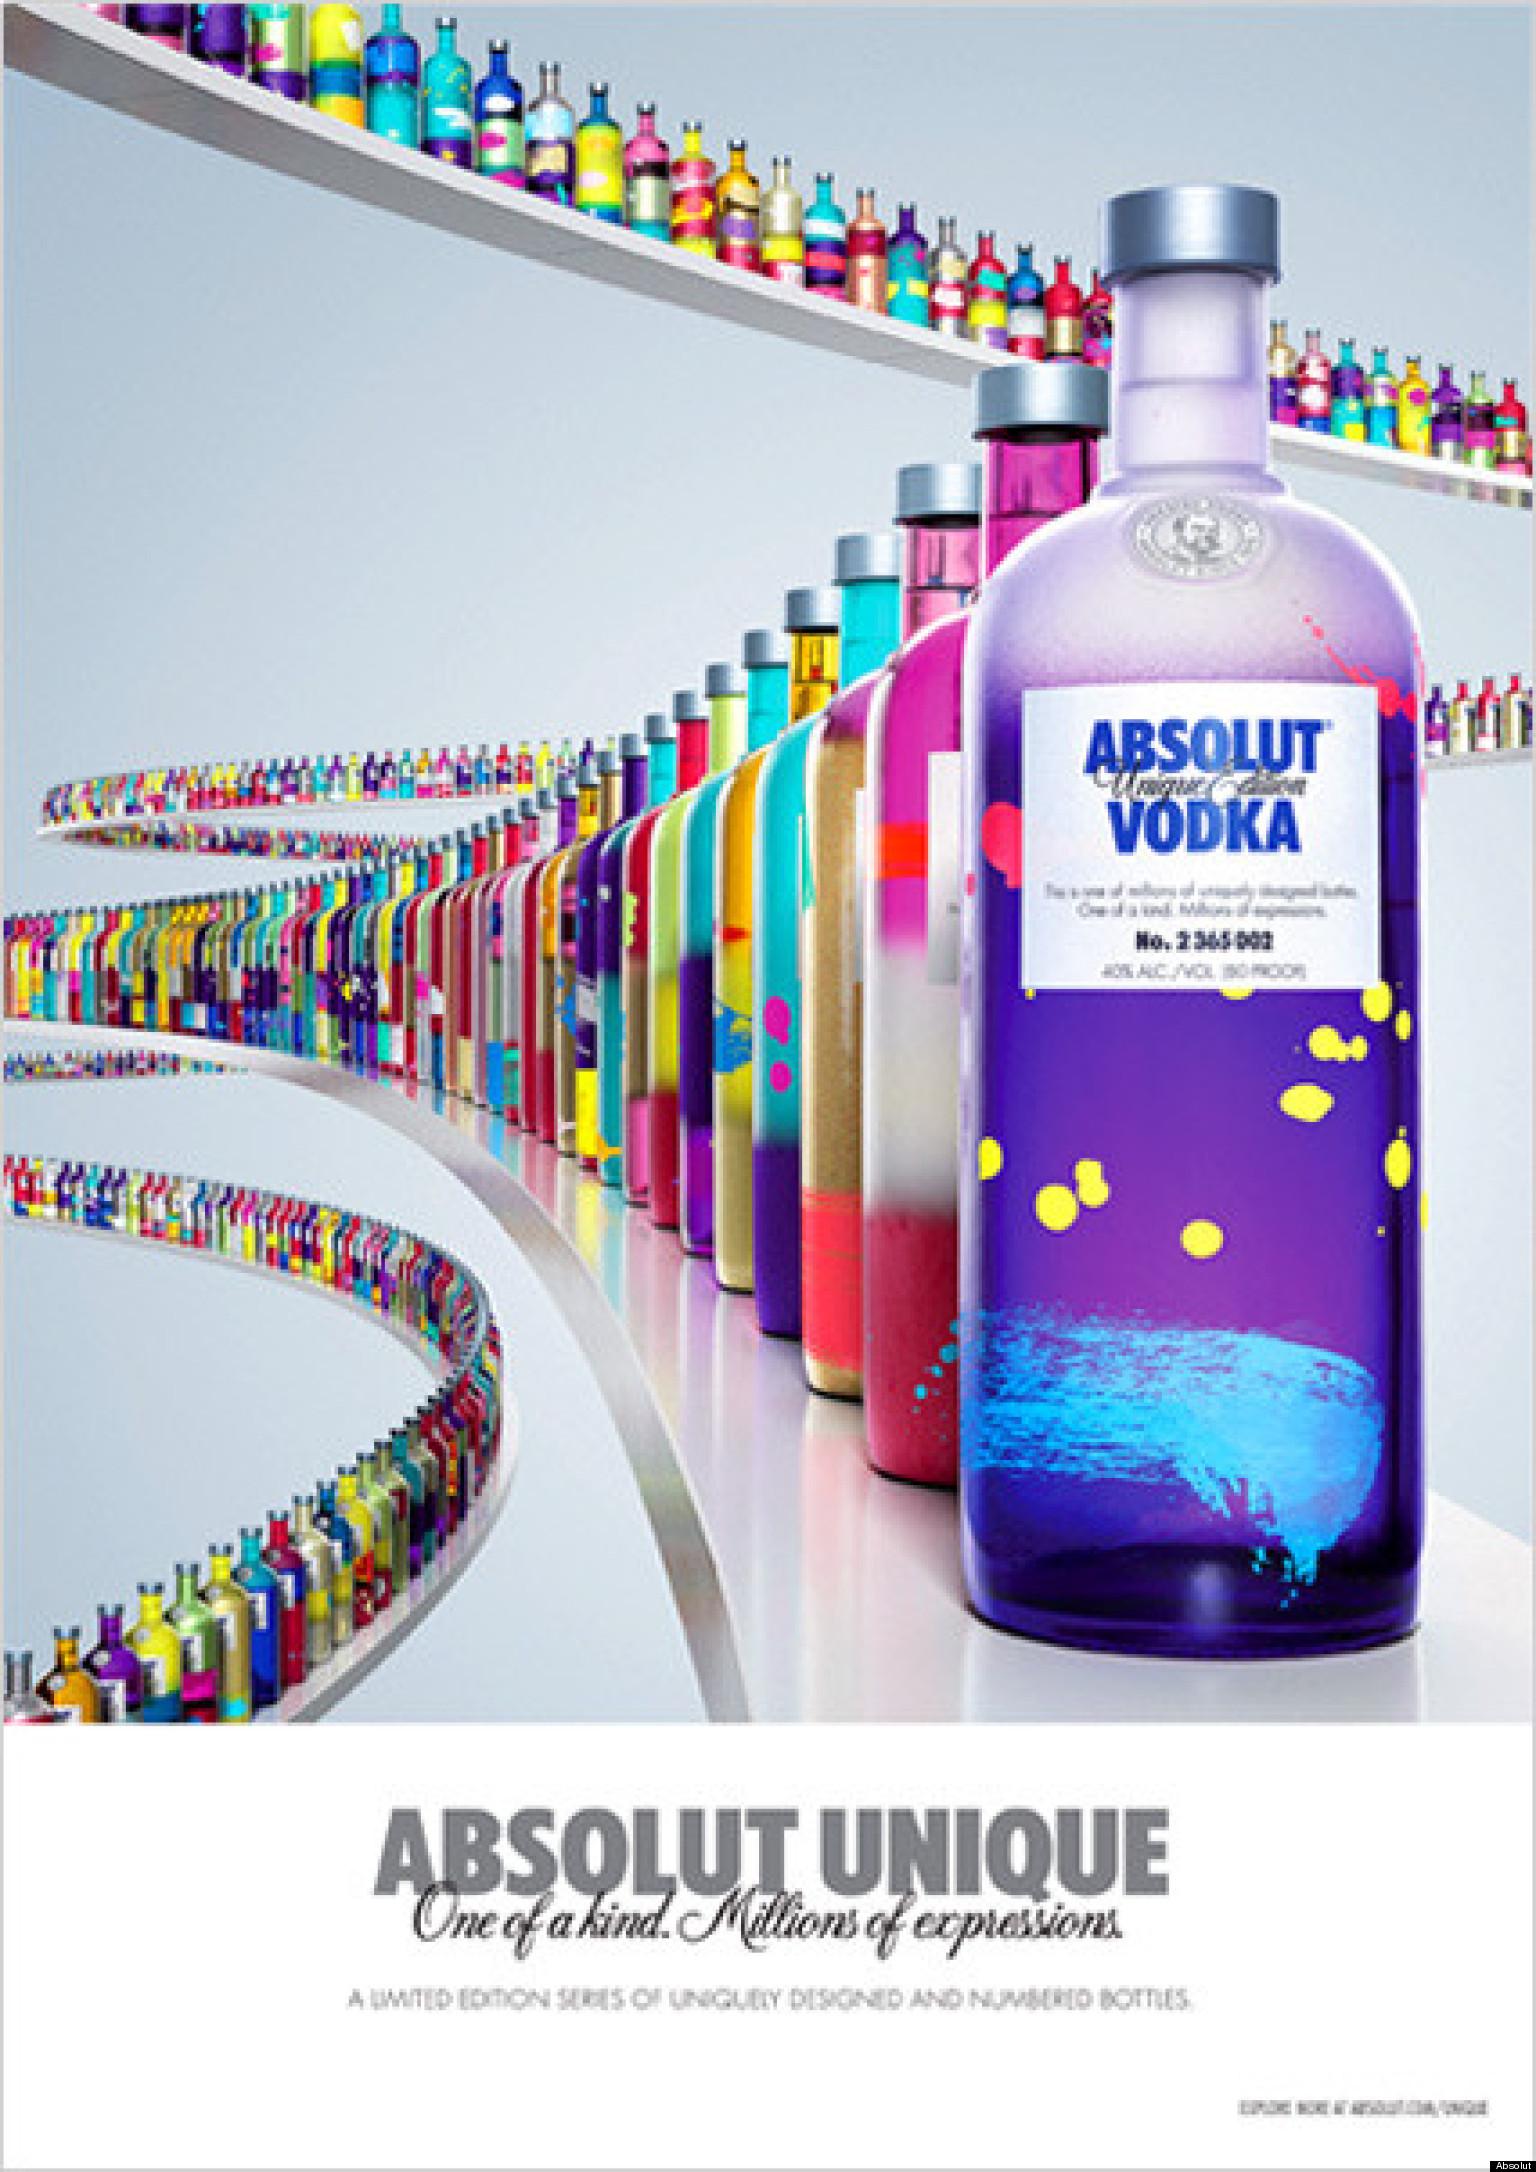 Absolut vodka 39 s 39 unique 39 company releases 4 million one for Unique one